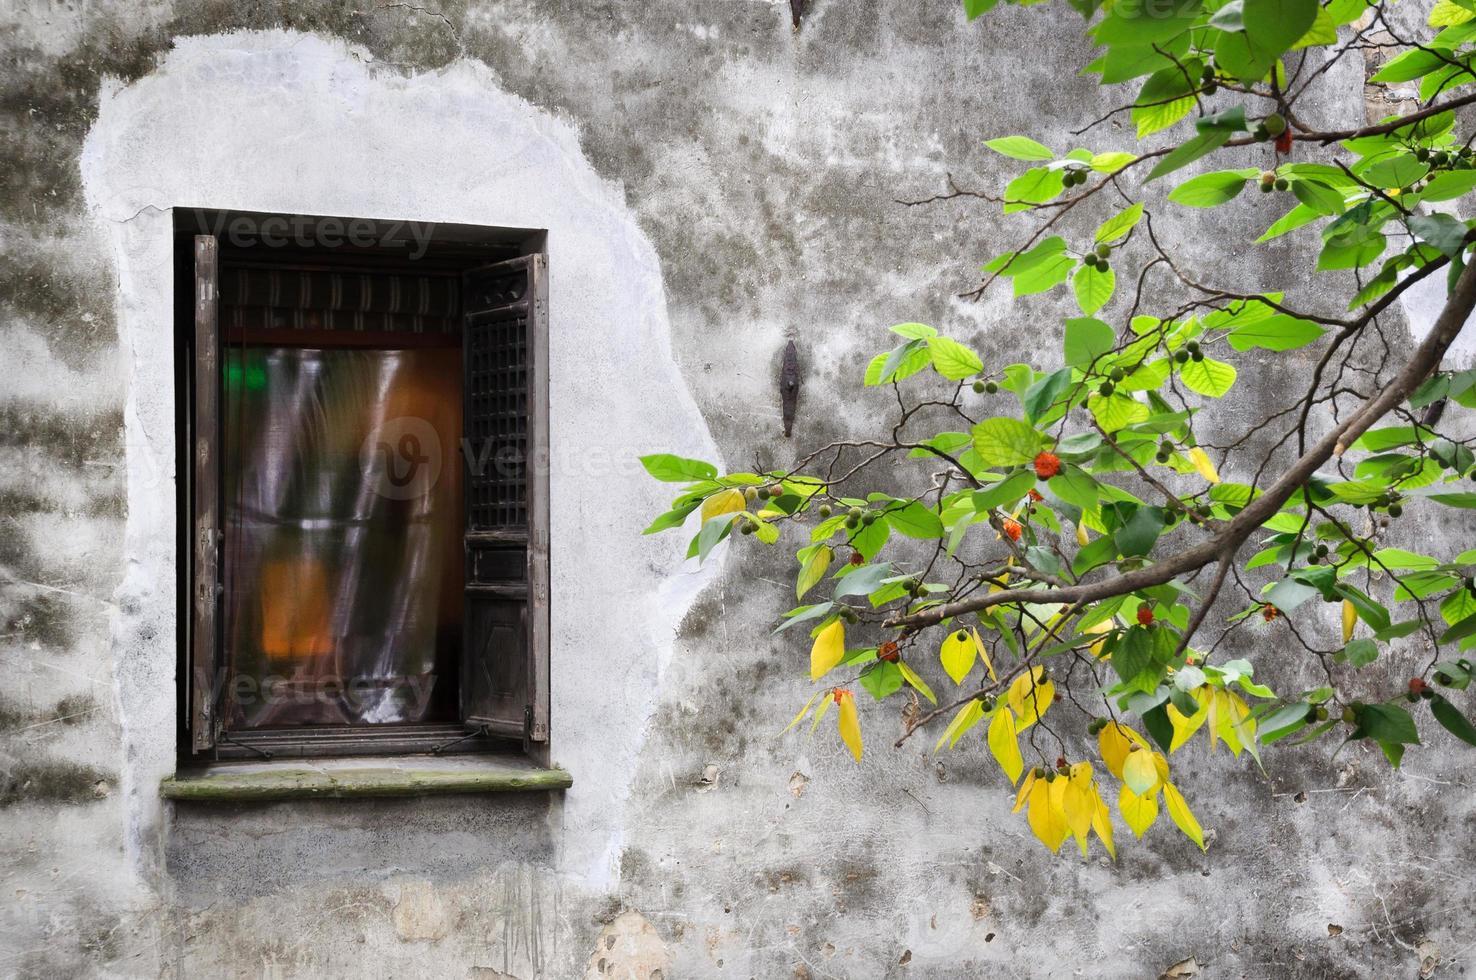 antiguo edificio residencial y rama verde en pingjianglu, suzhou, china foto